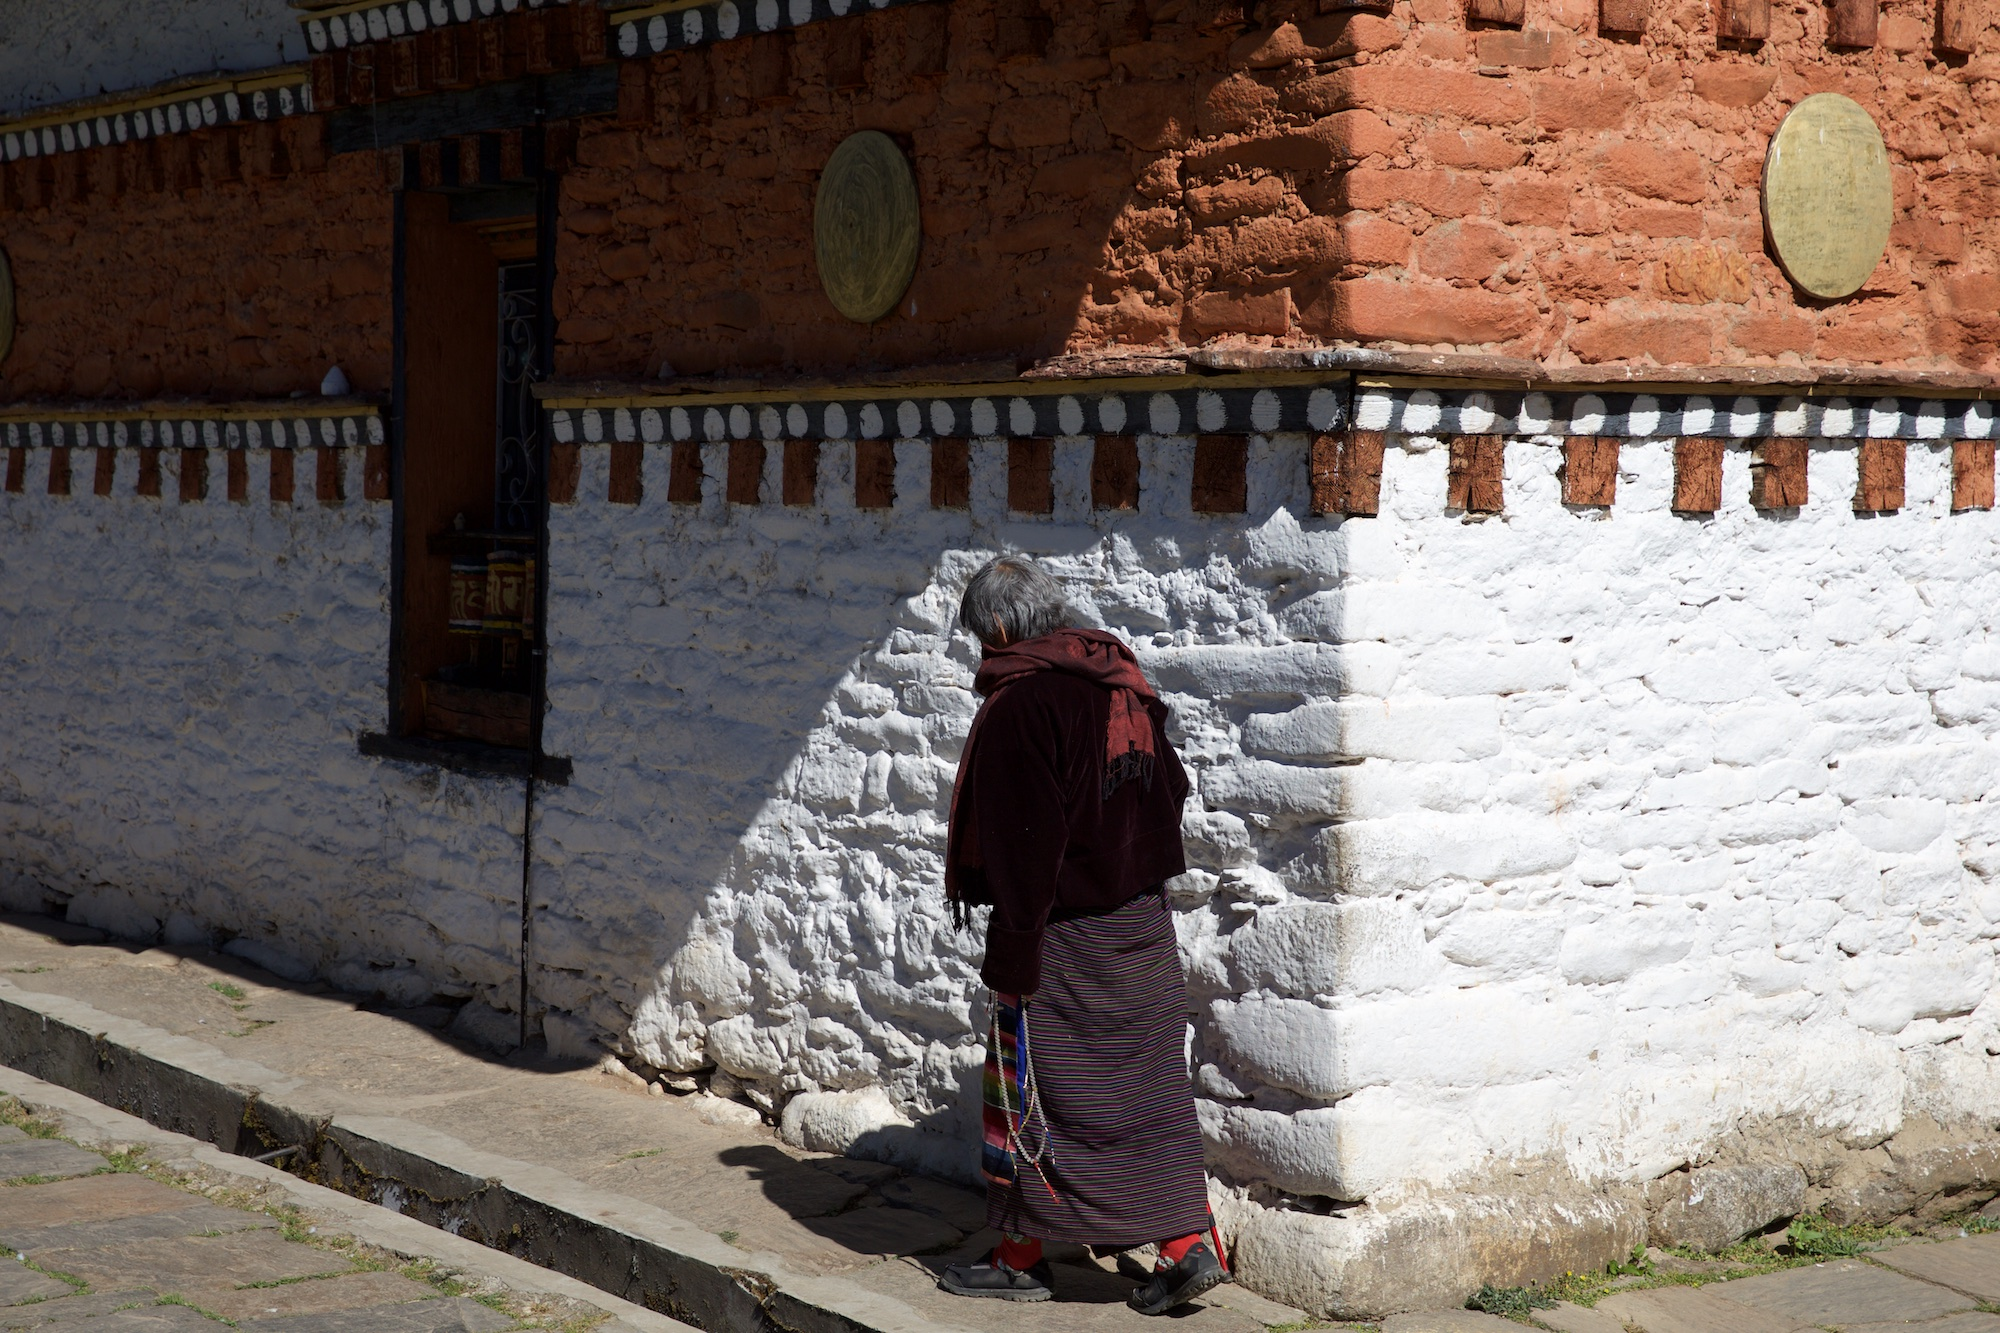 Bhutan-2016- C26O8188.jpg